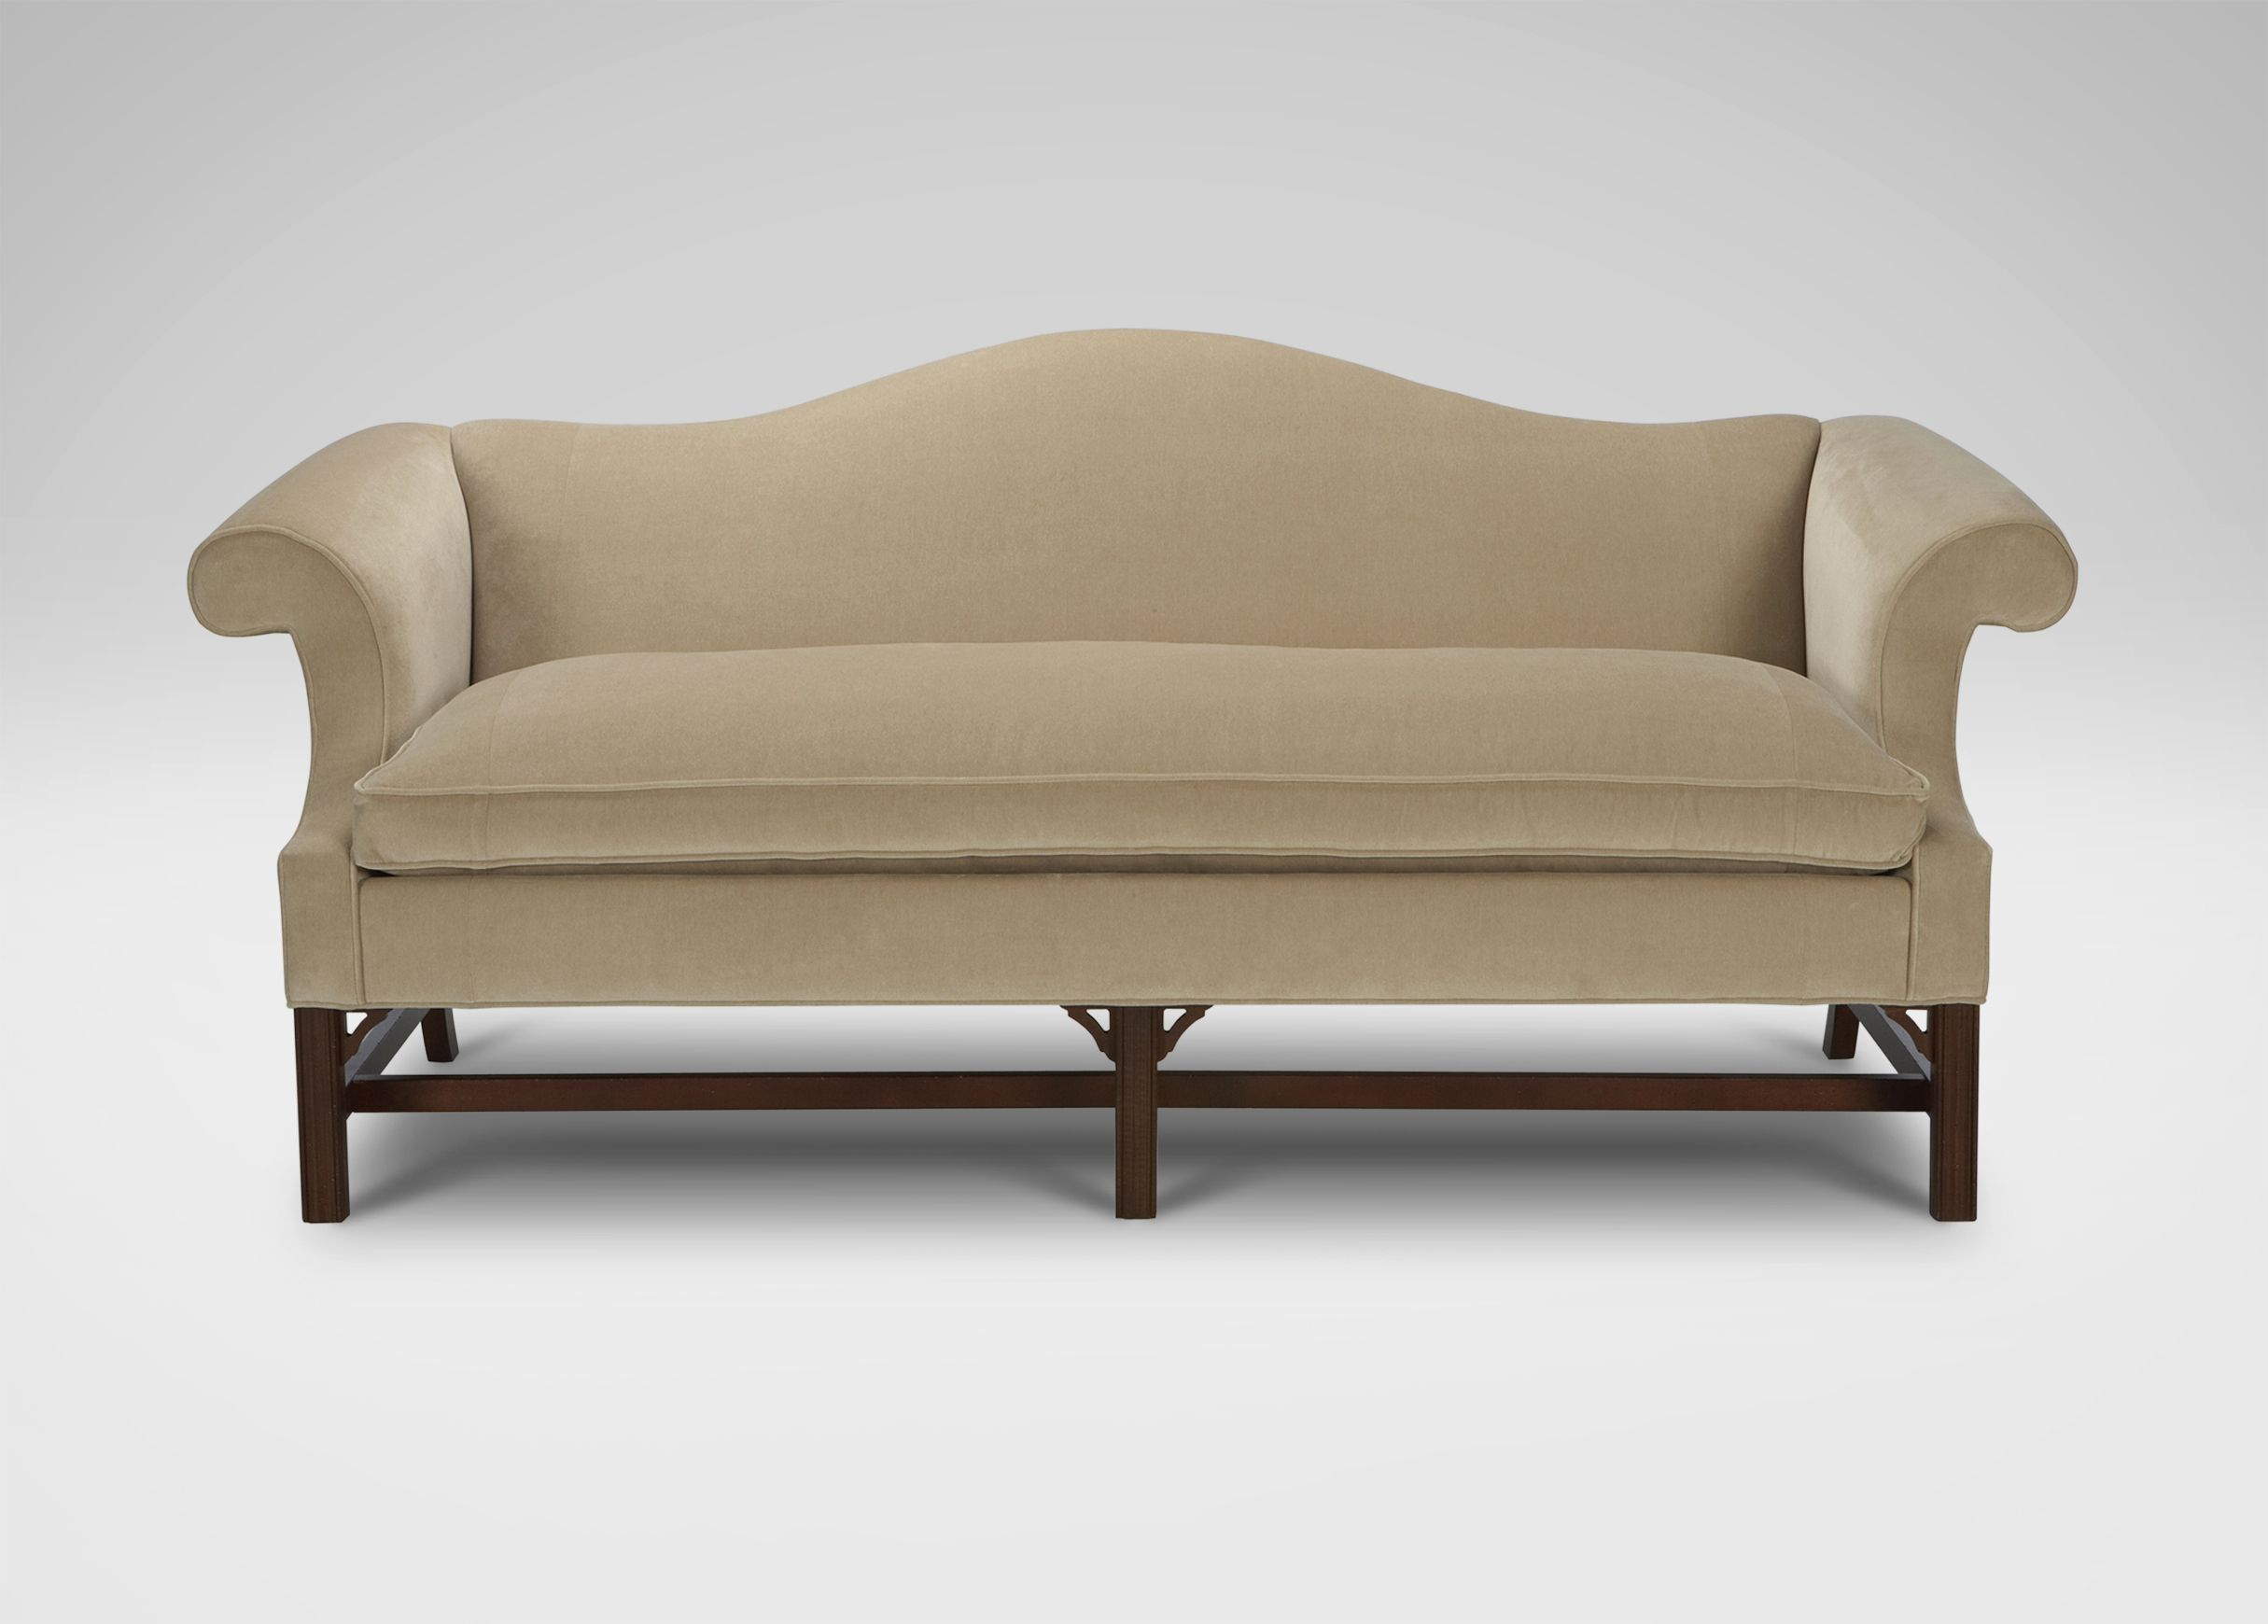 ethan allen camelback sofa by soulandlovedesigns on etsy 725 00 rh pinterest com